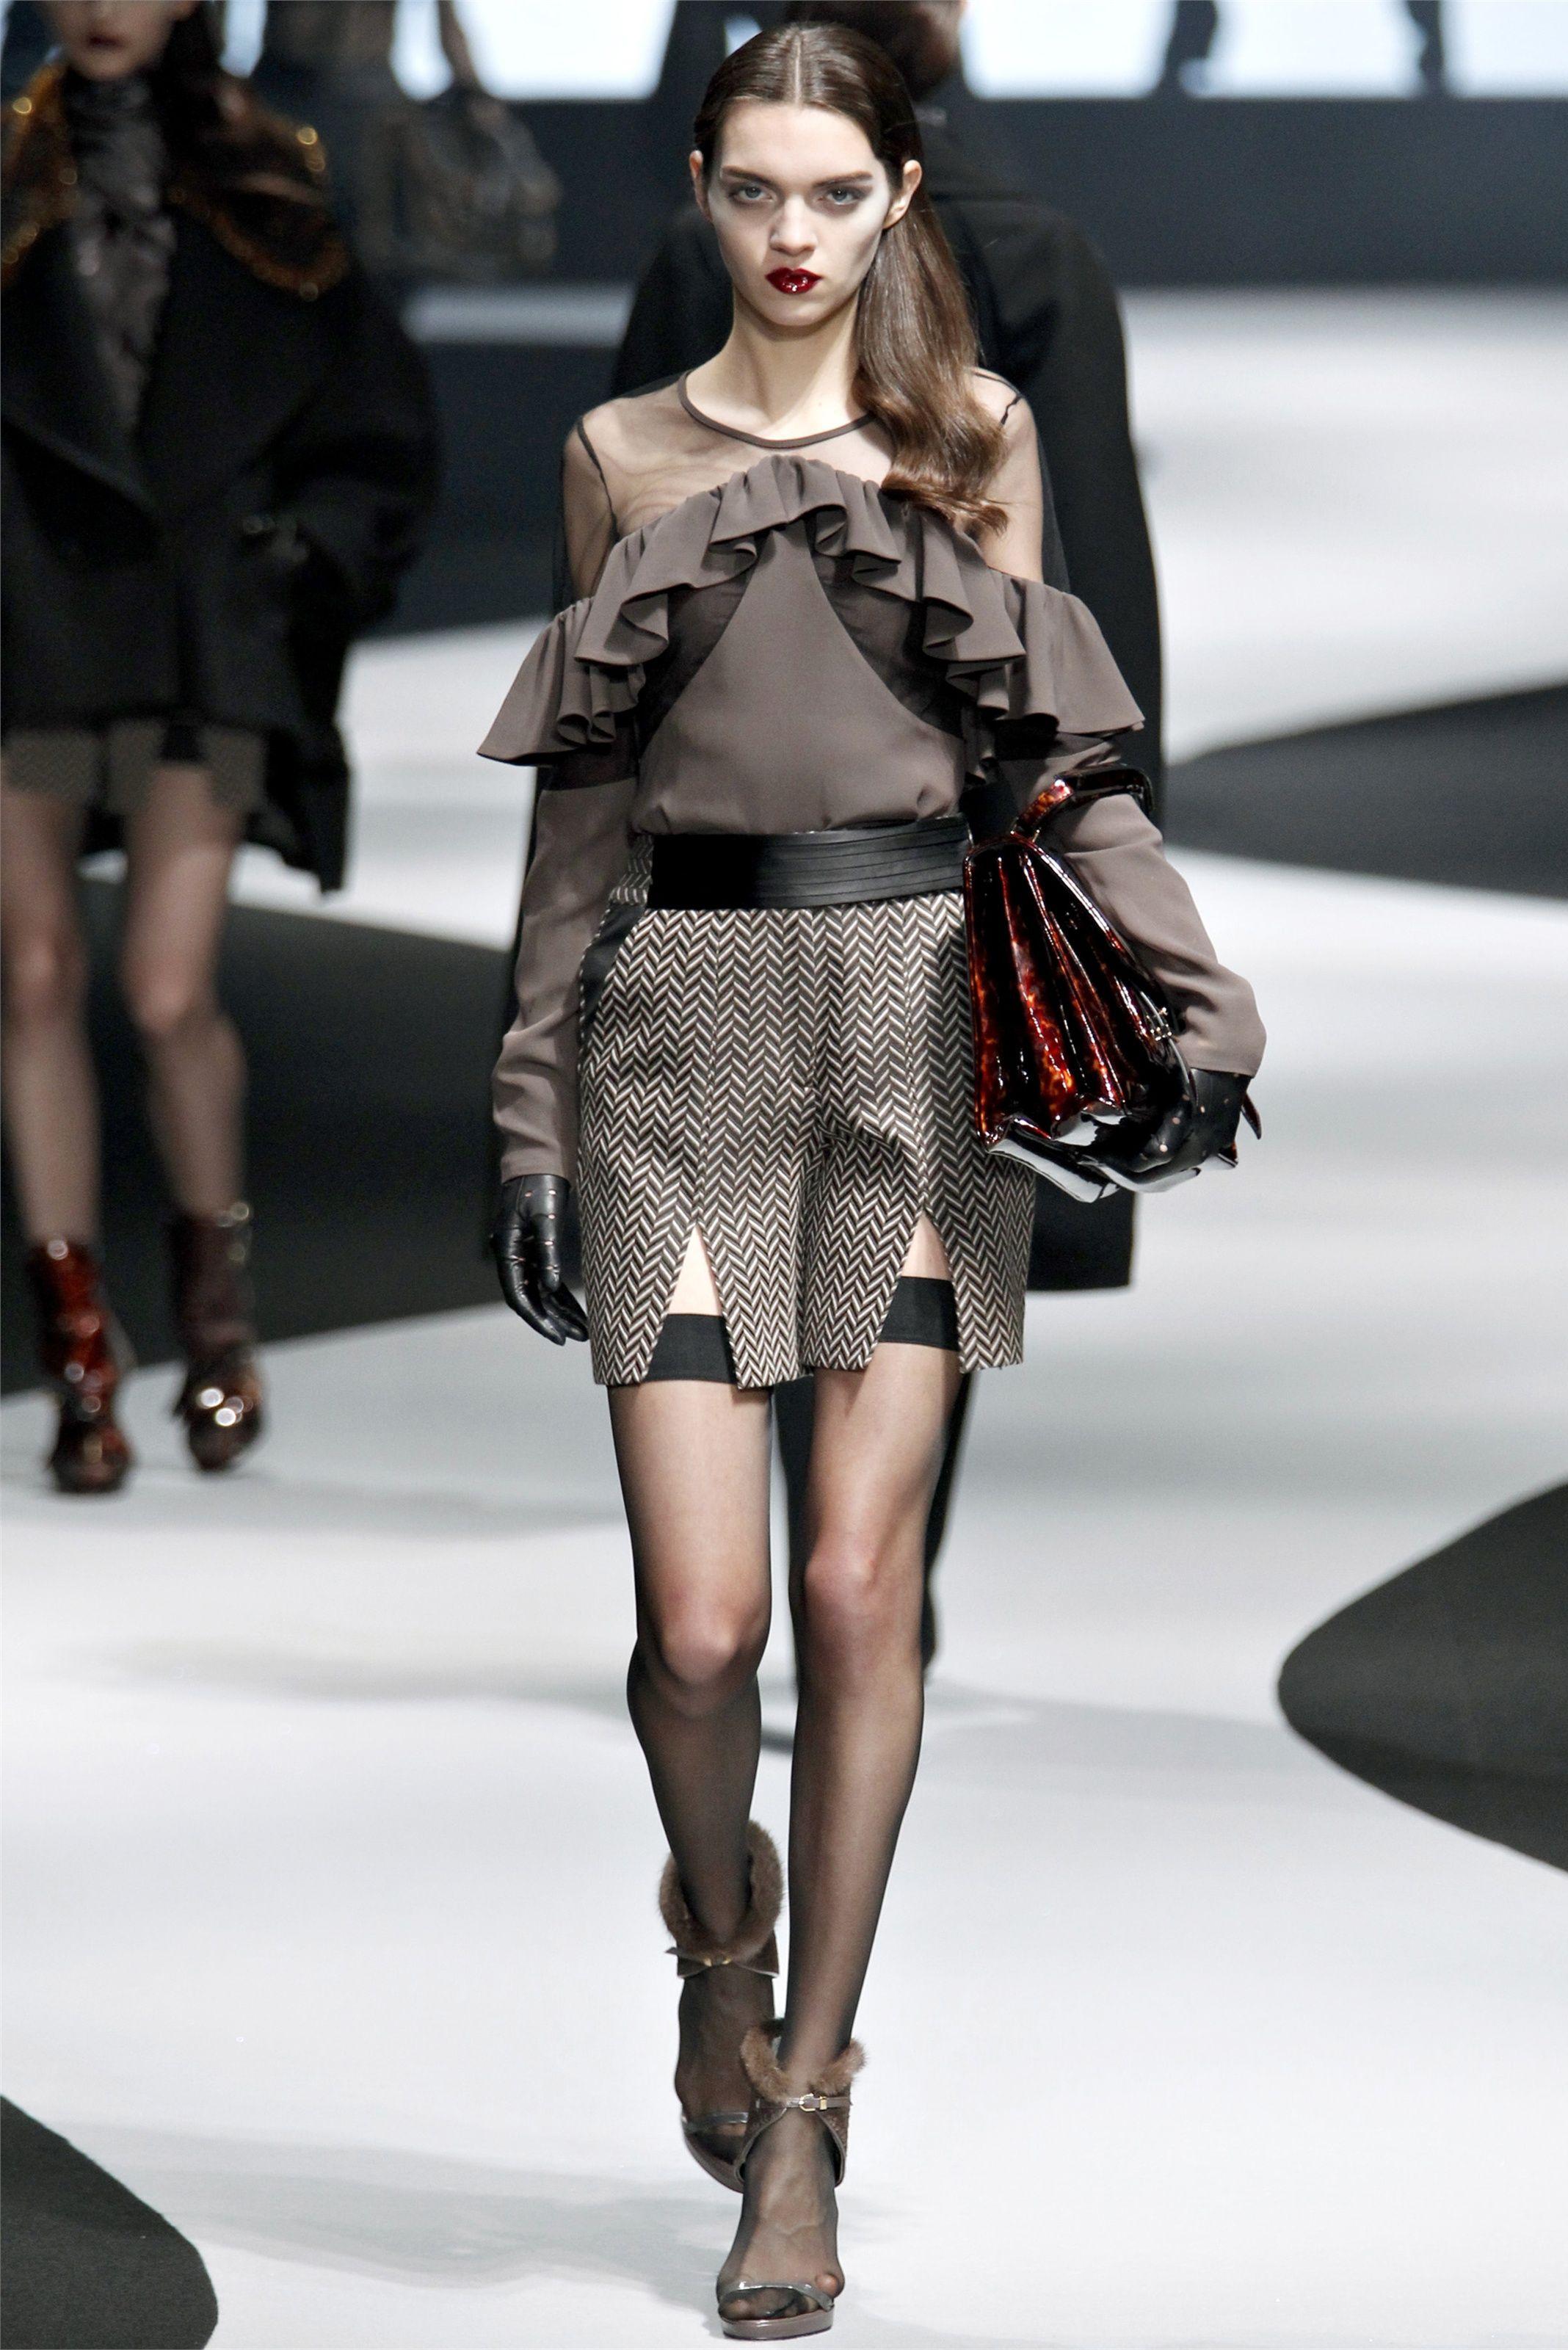 Sfilata Viktor & Rolf Parigi – Collezioni Autunno Inverno 2012-13 – Vogue